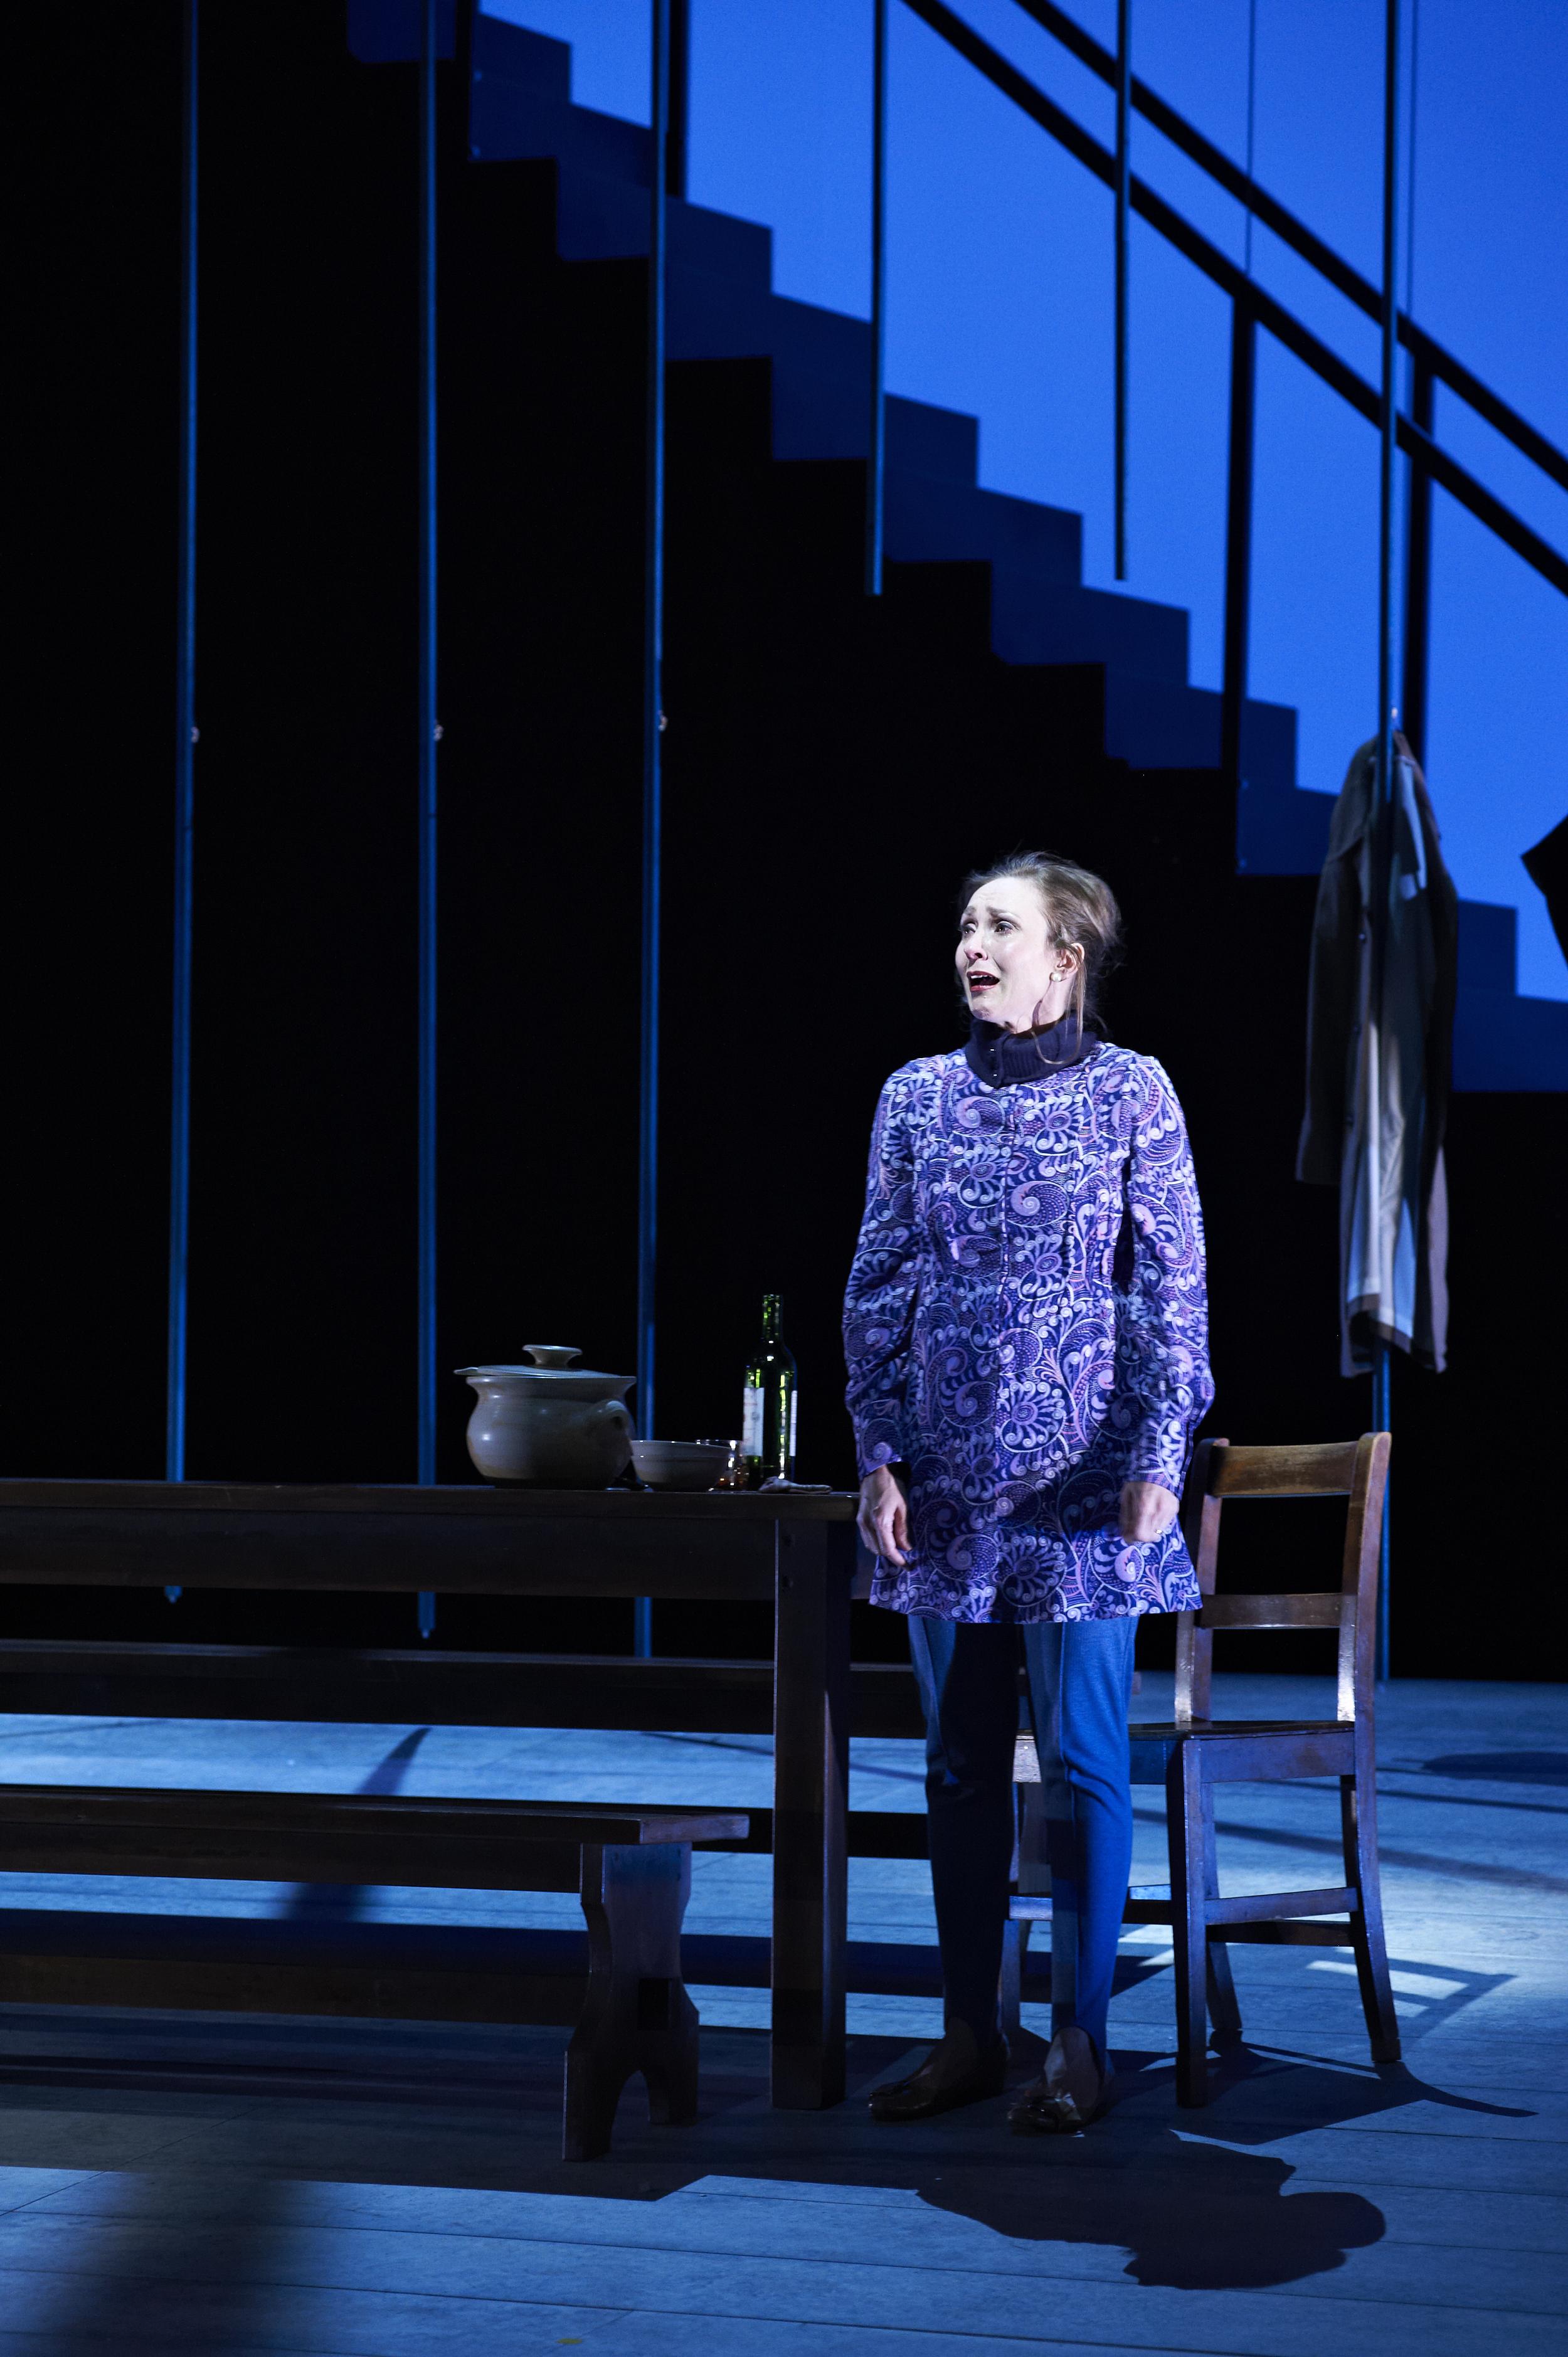 When the rain stops falling, Alison Van Reeken, directed by Adam Mitchell, Andrew Bovell